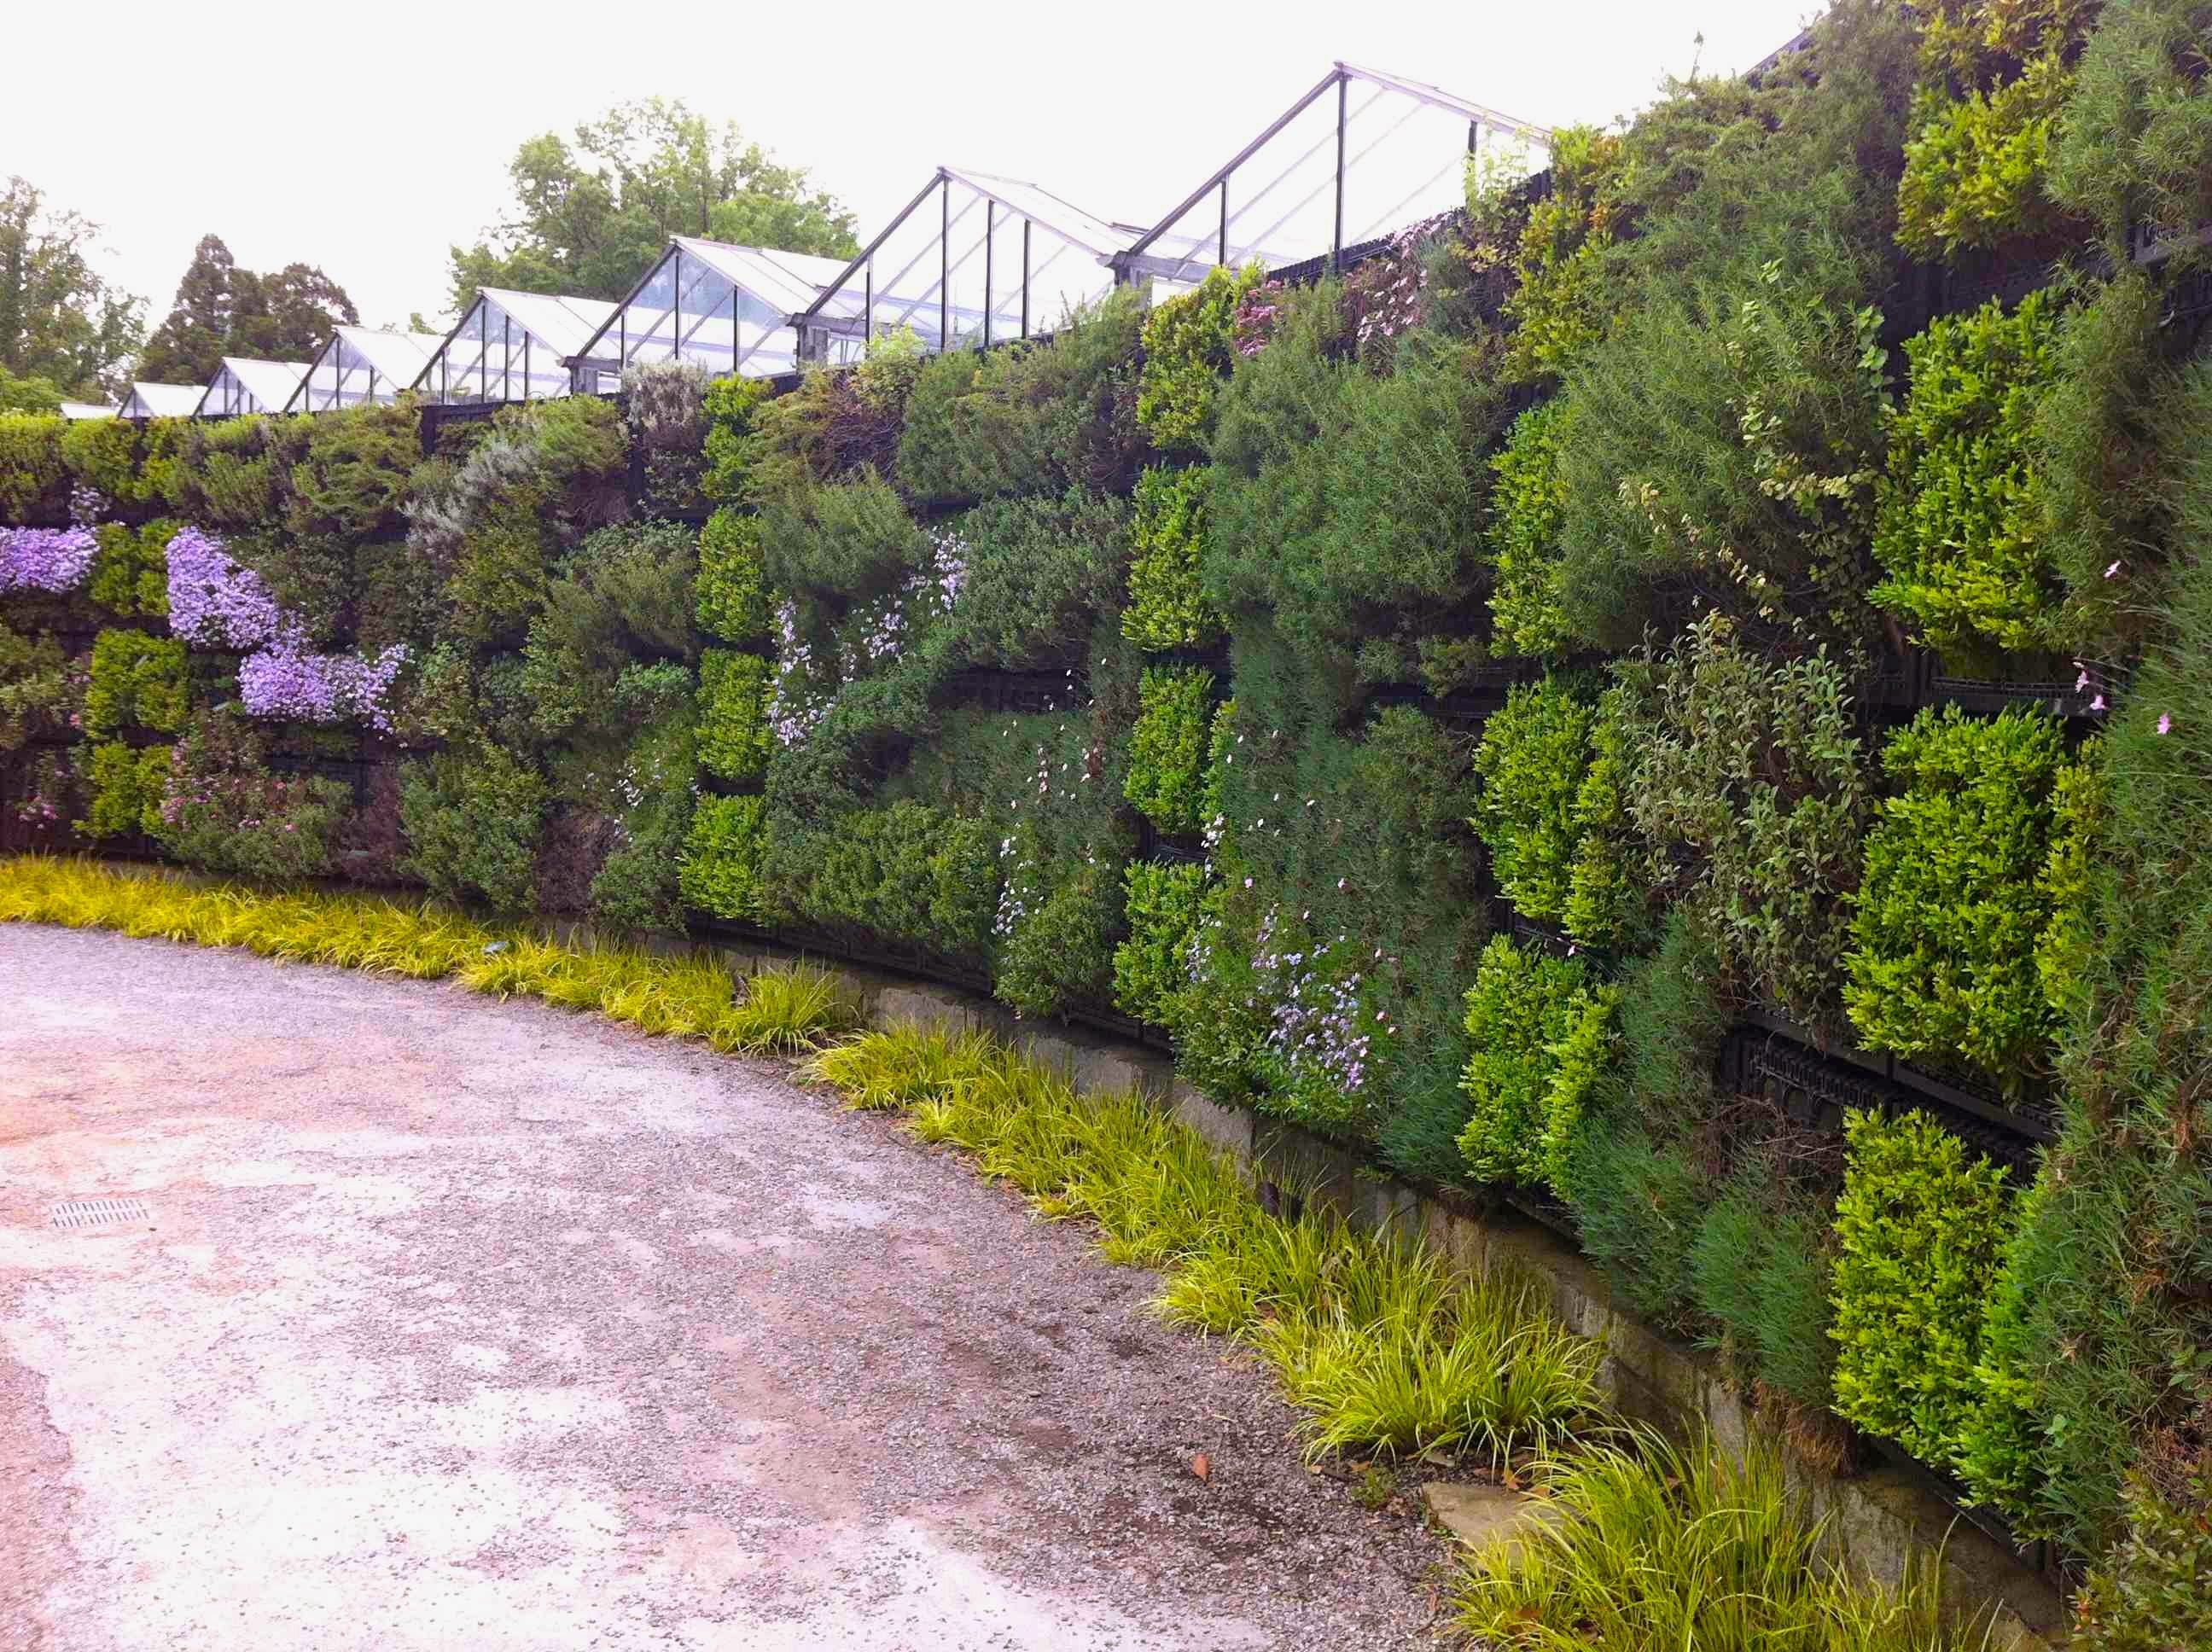 A Beautiful Living Wall At The Atlanta Botanical Garden Planted With  Various Herbs And Medicinal Plants